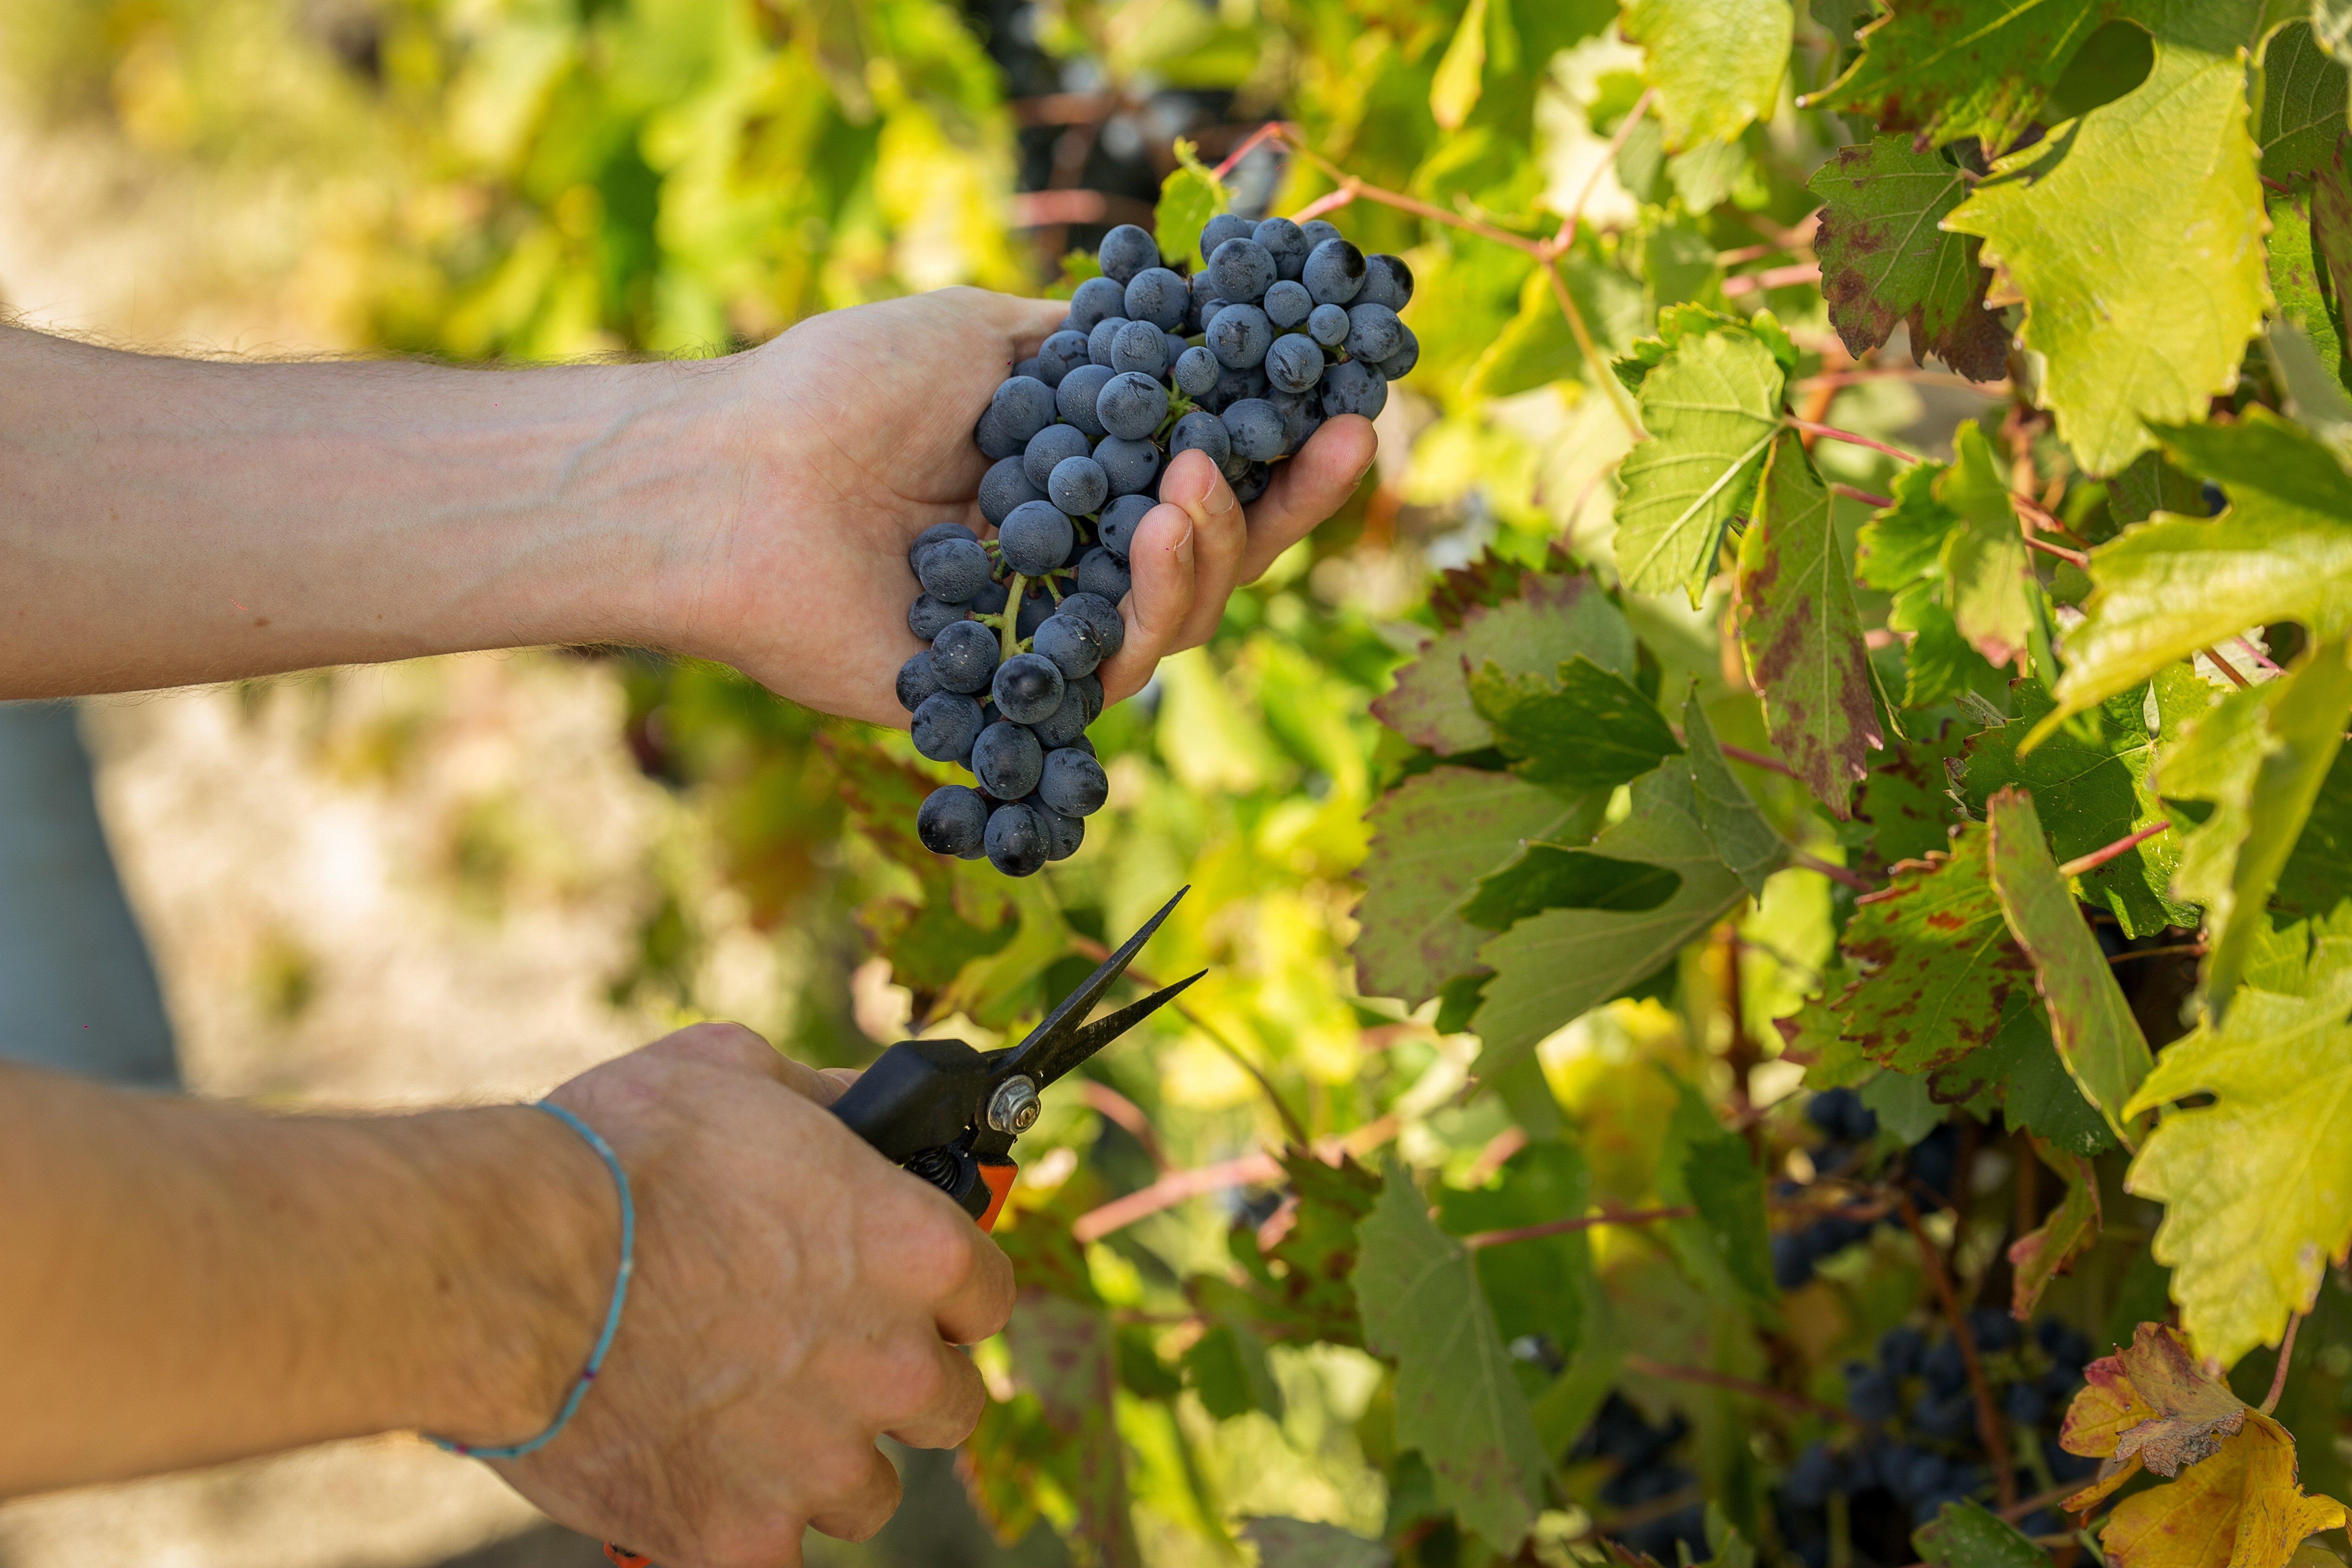 Divinea wine experiences and wine tasting